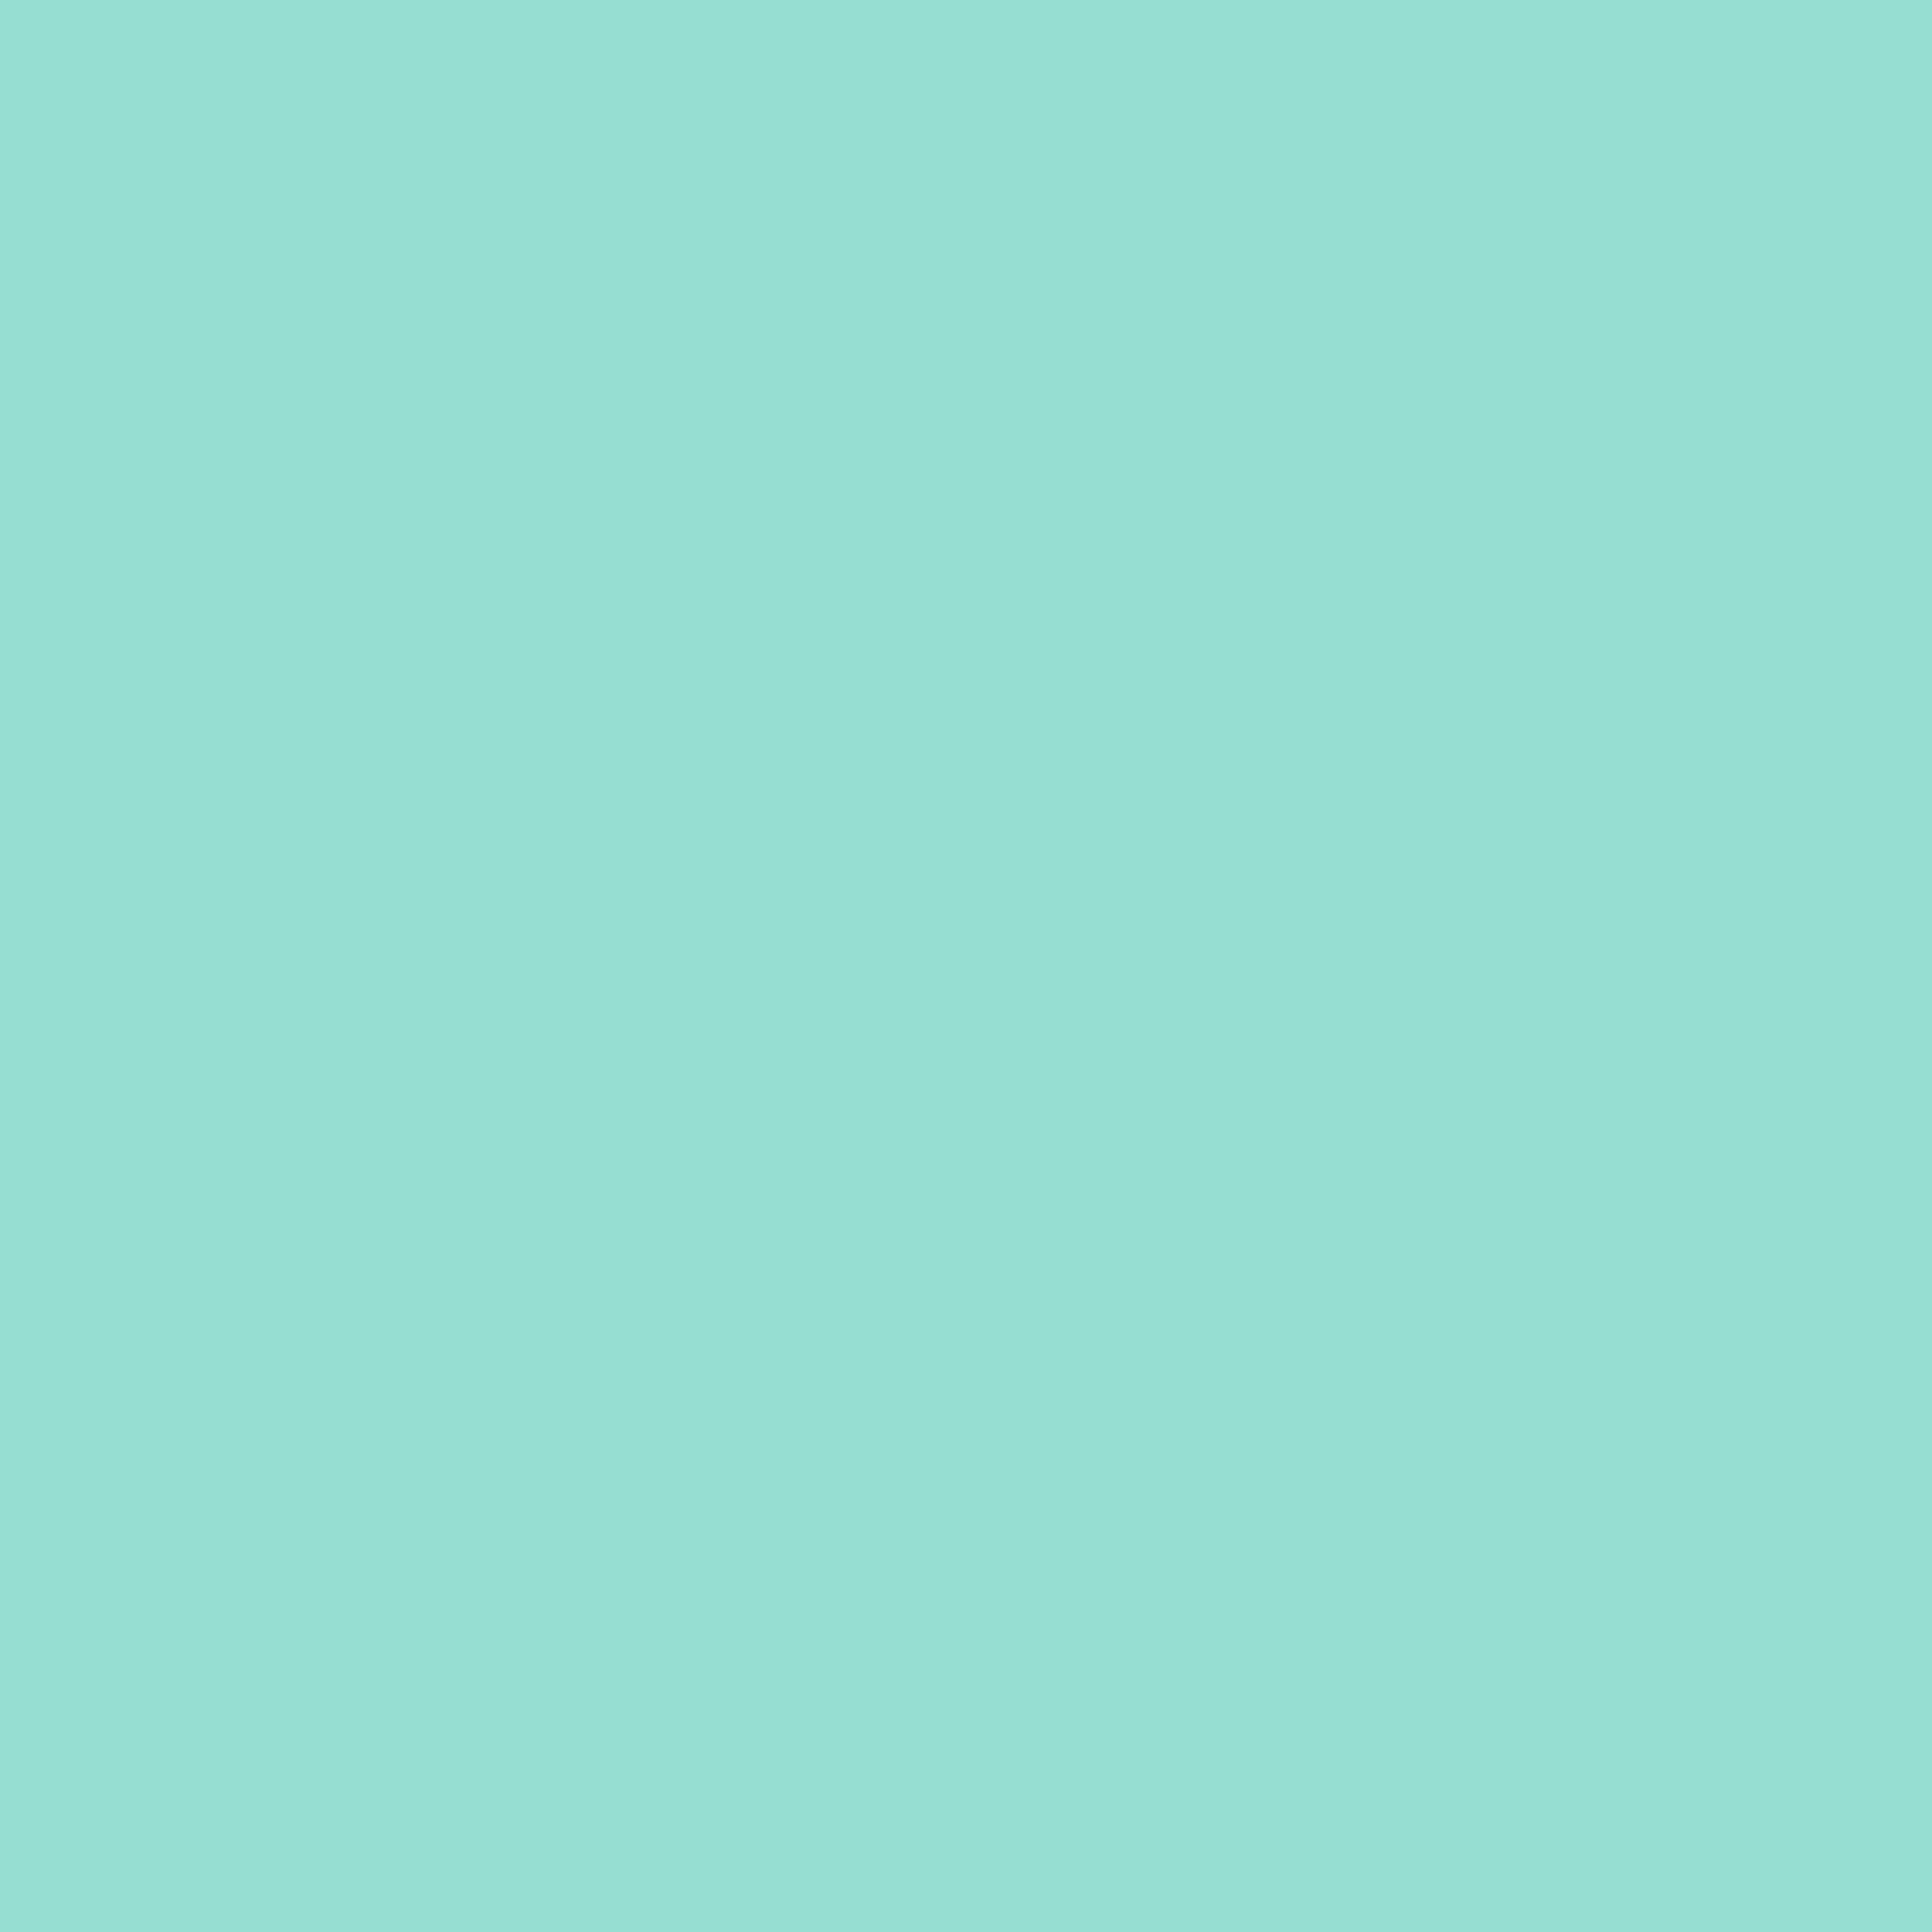 2732x2732 Pale Robin Egg Blue Solid Color Background